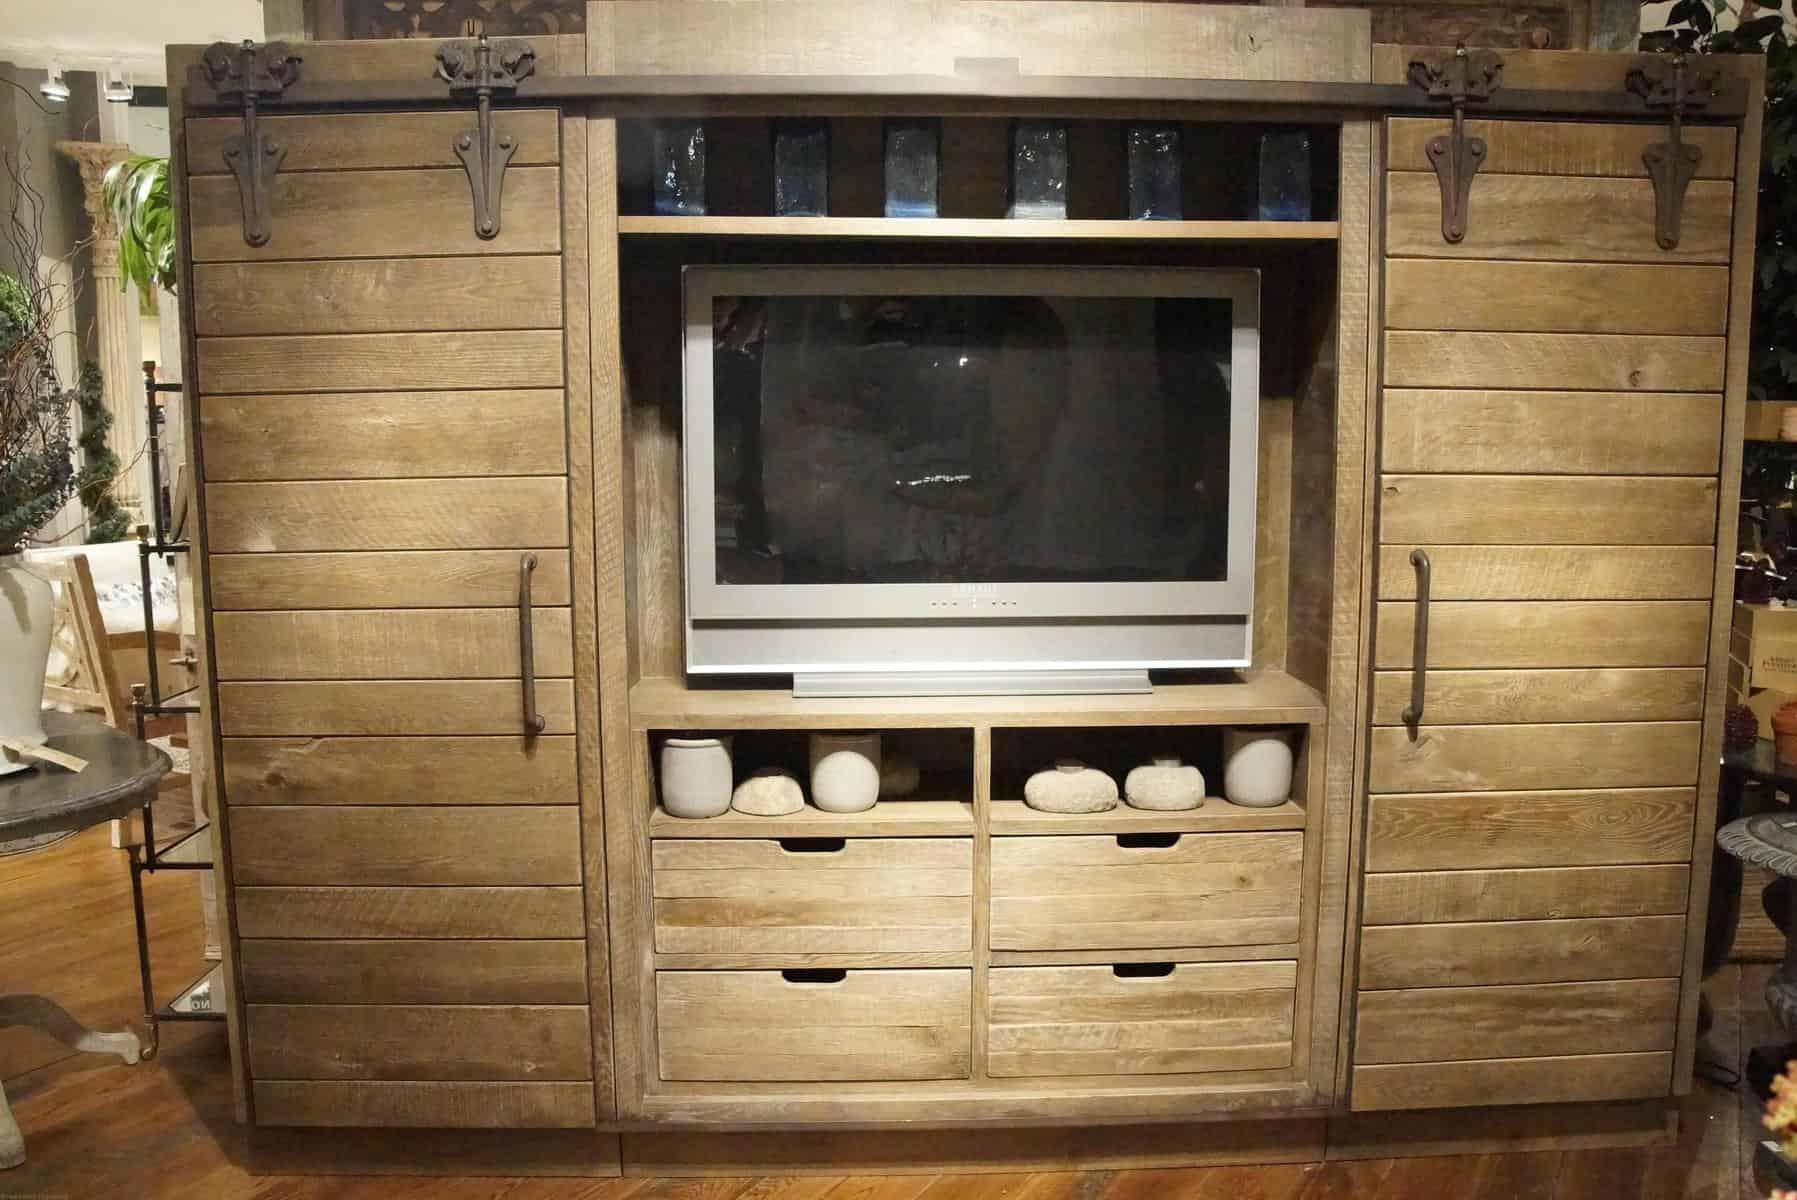 arhaus furniture favorite source for home decor heartworkorg com bedroom furniture gt bedside tables and nightstands